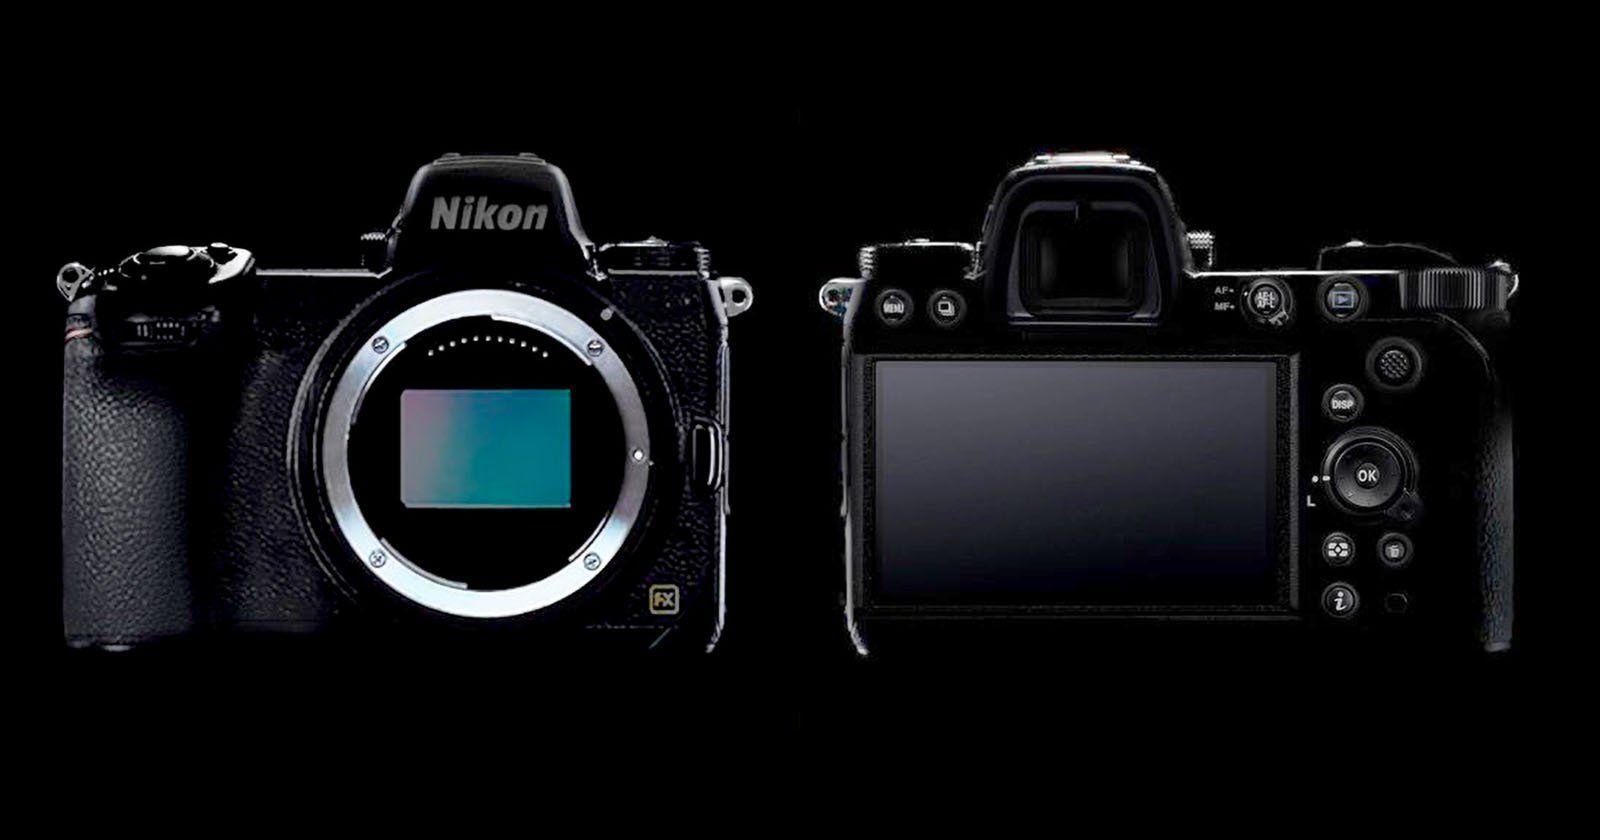 Nikon Z6 and Z7 Full-Frame Mirrorless Cameras and 3 Lenses